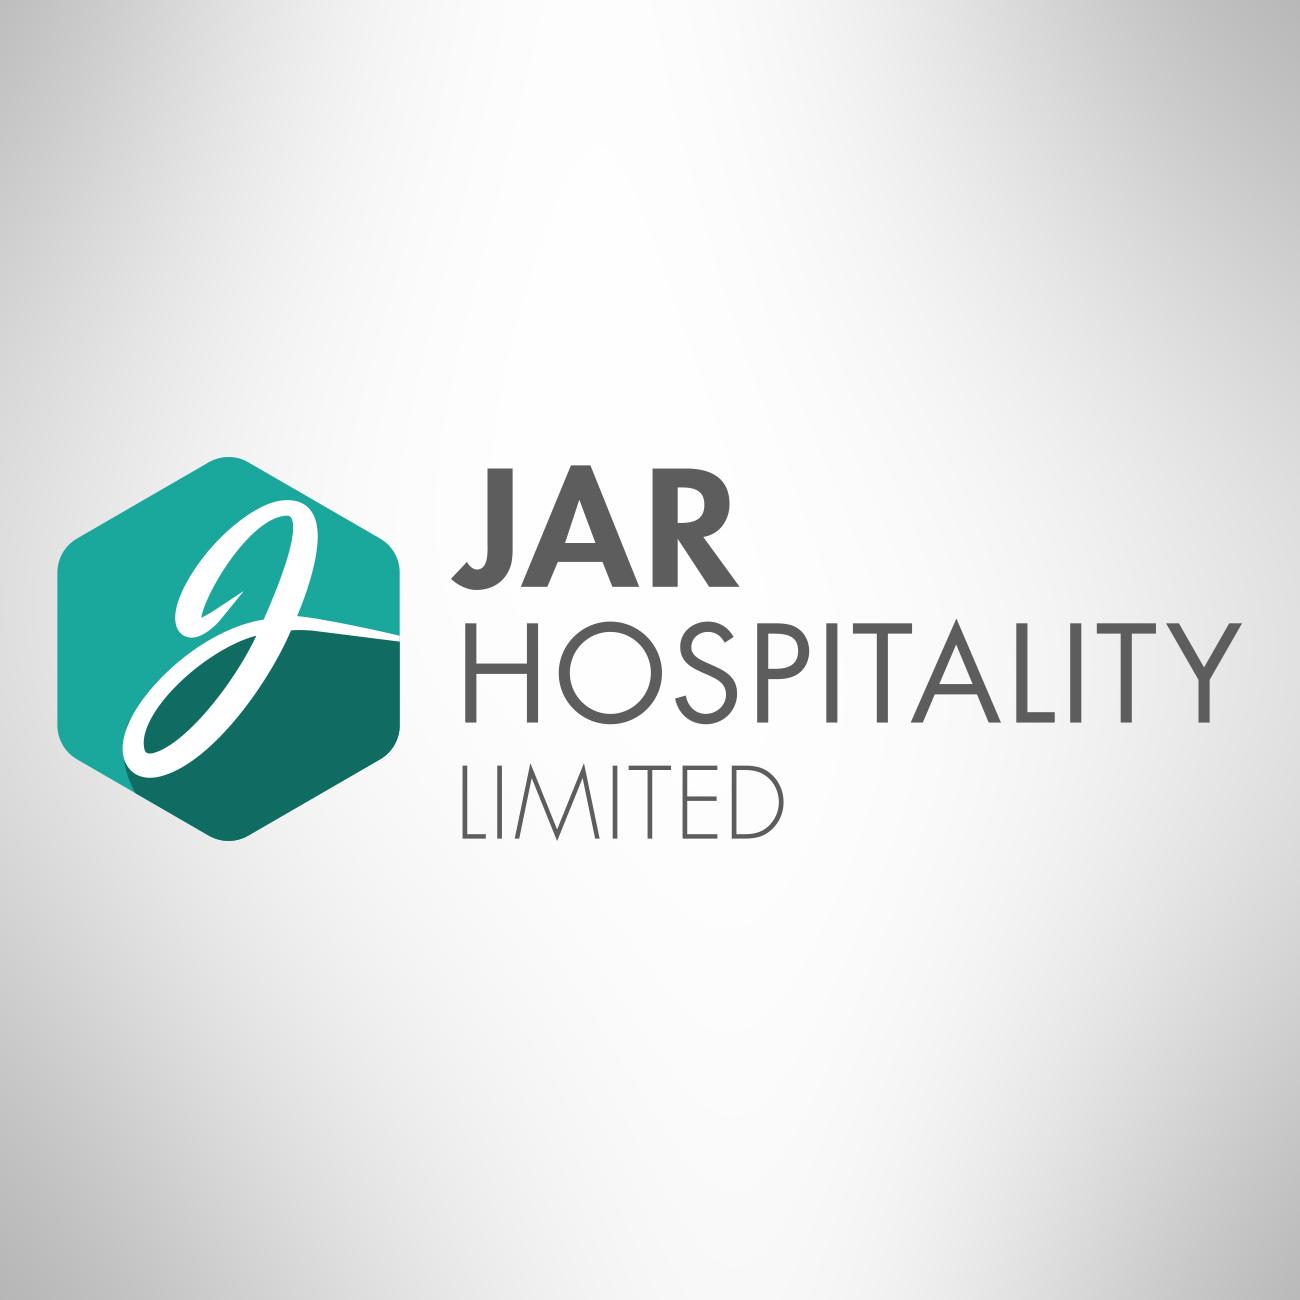 Jar hospitality logo